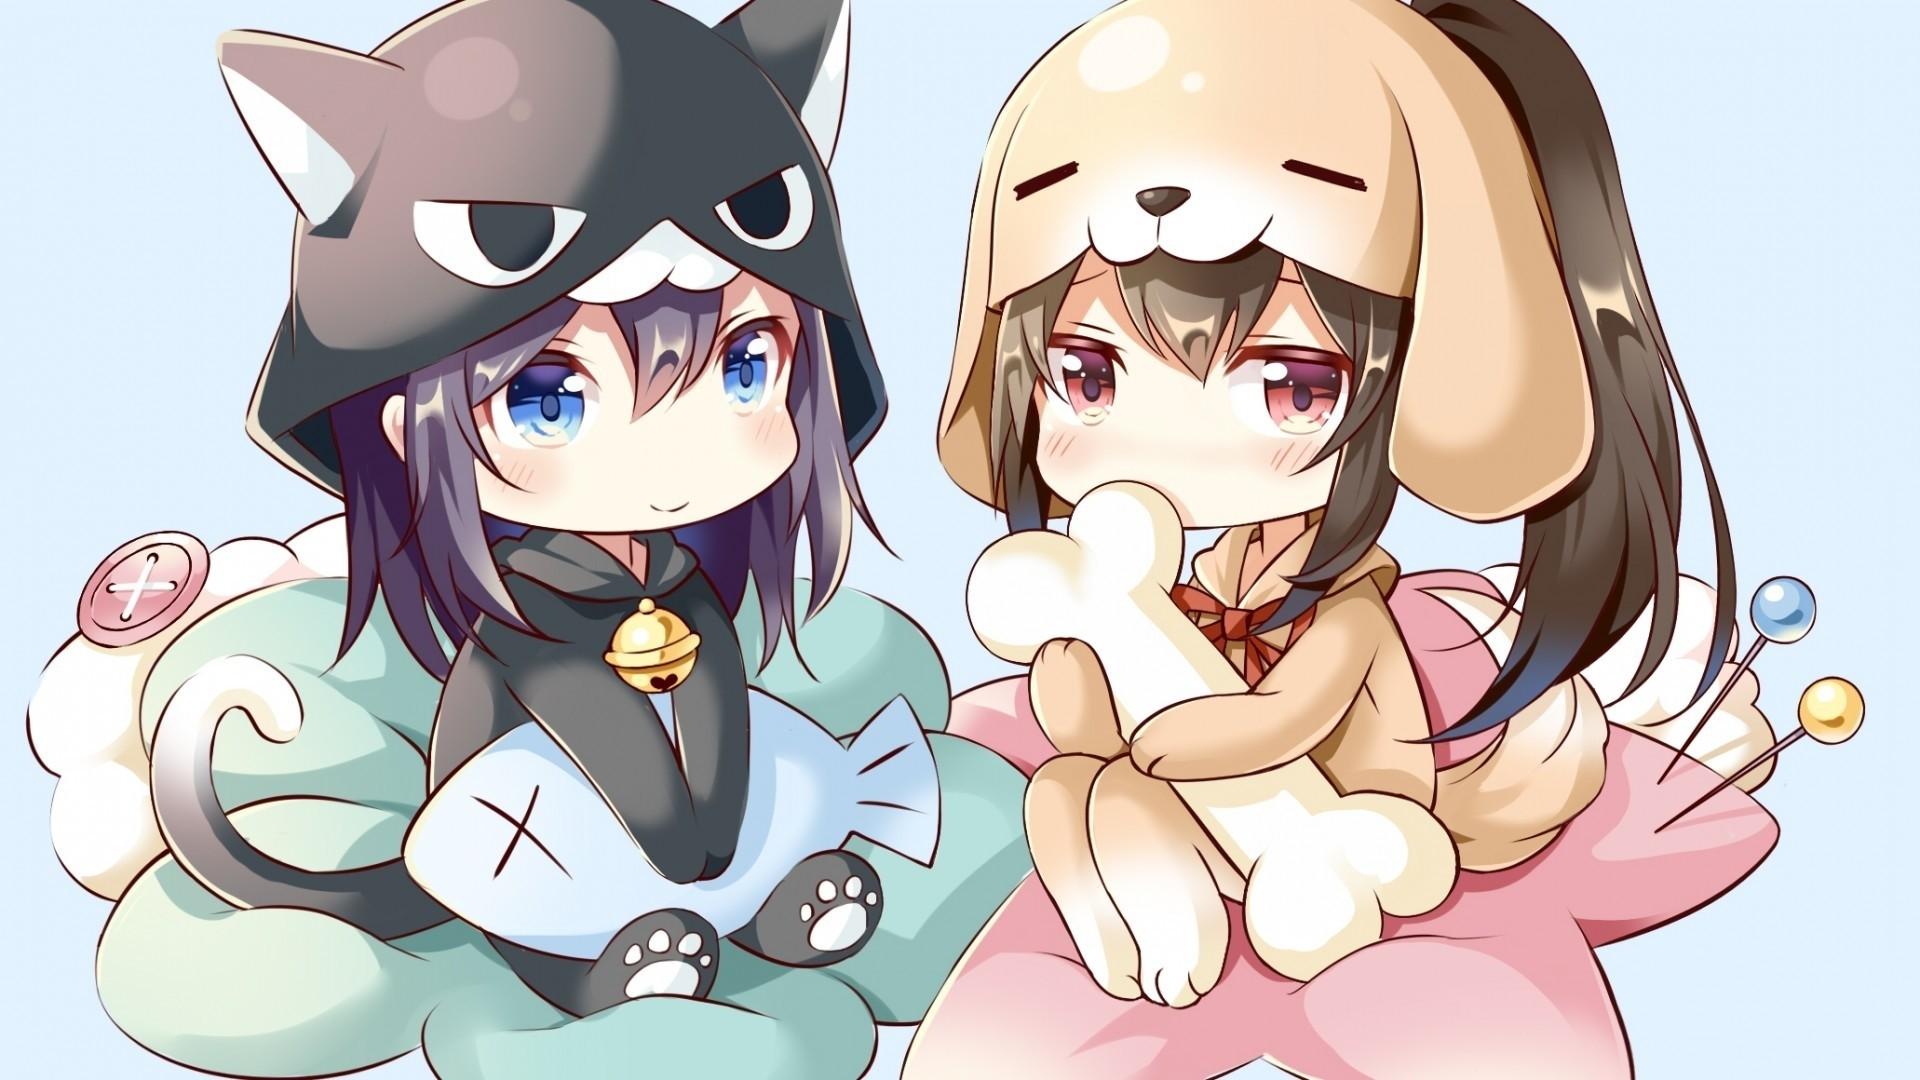 Chibi Anime Girl HD Wallpaper